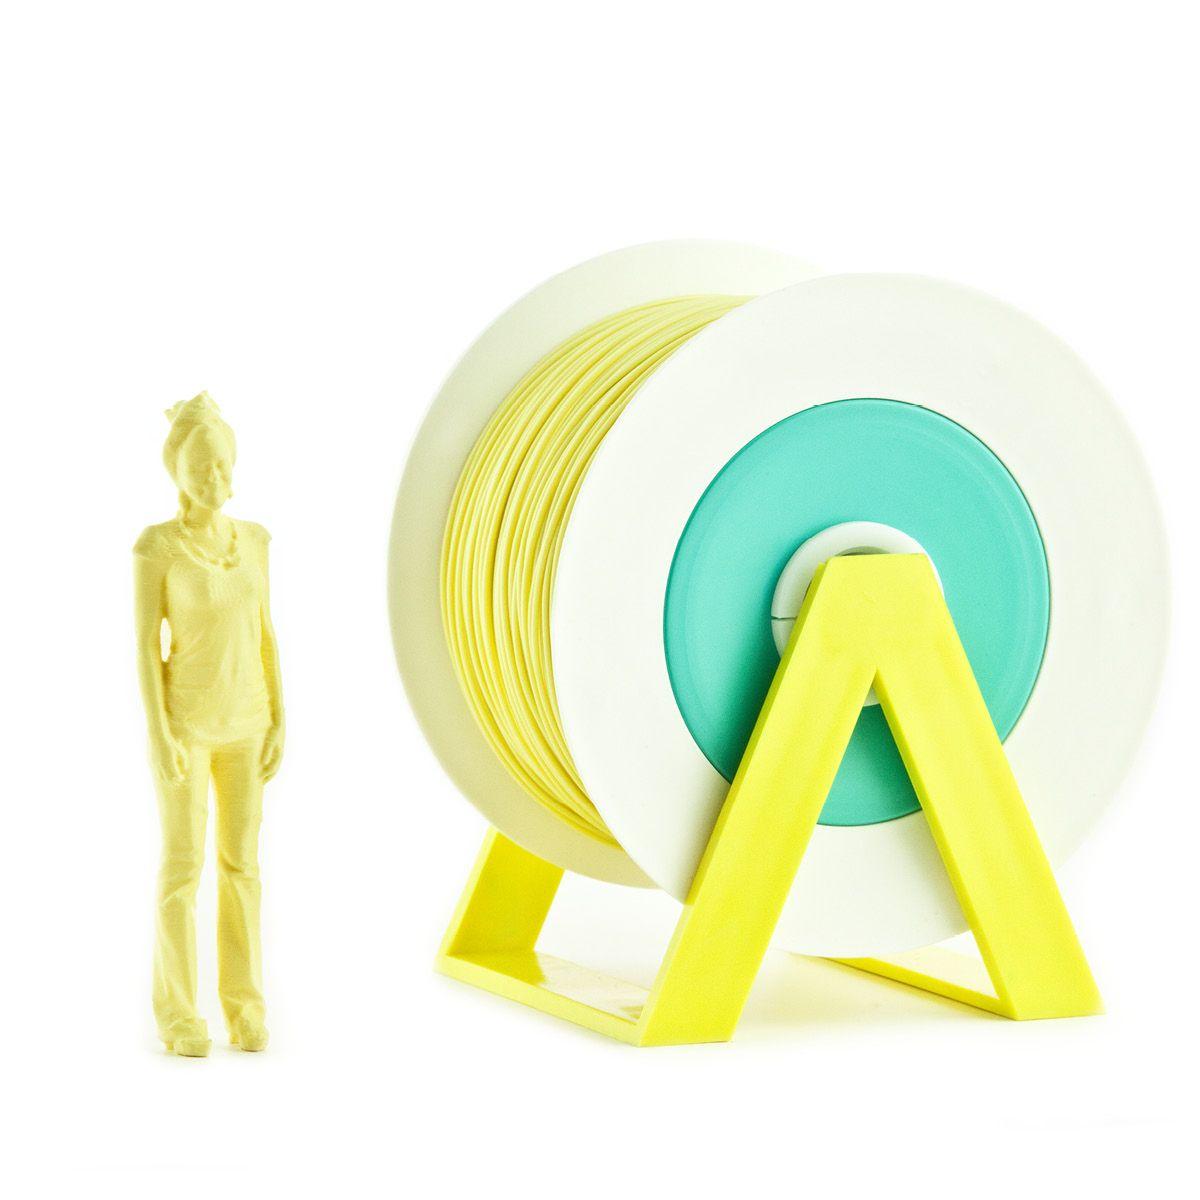 PLA Filament | Color: Yellow Ochre